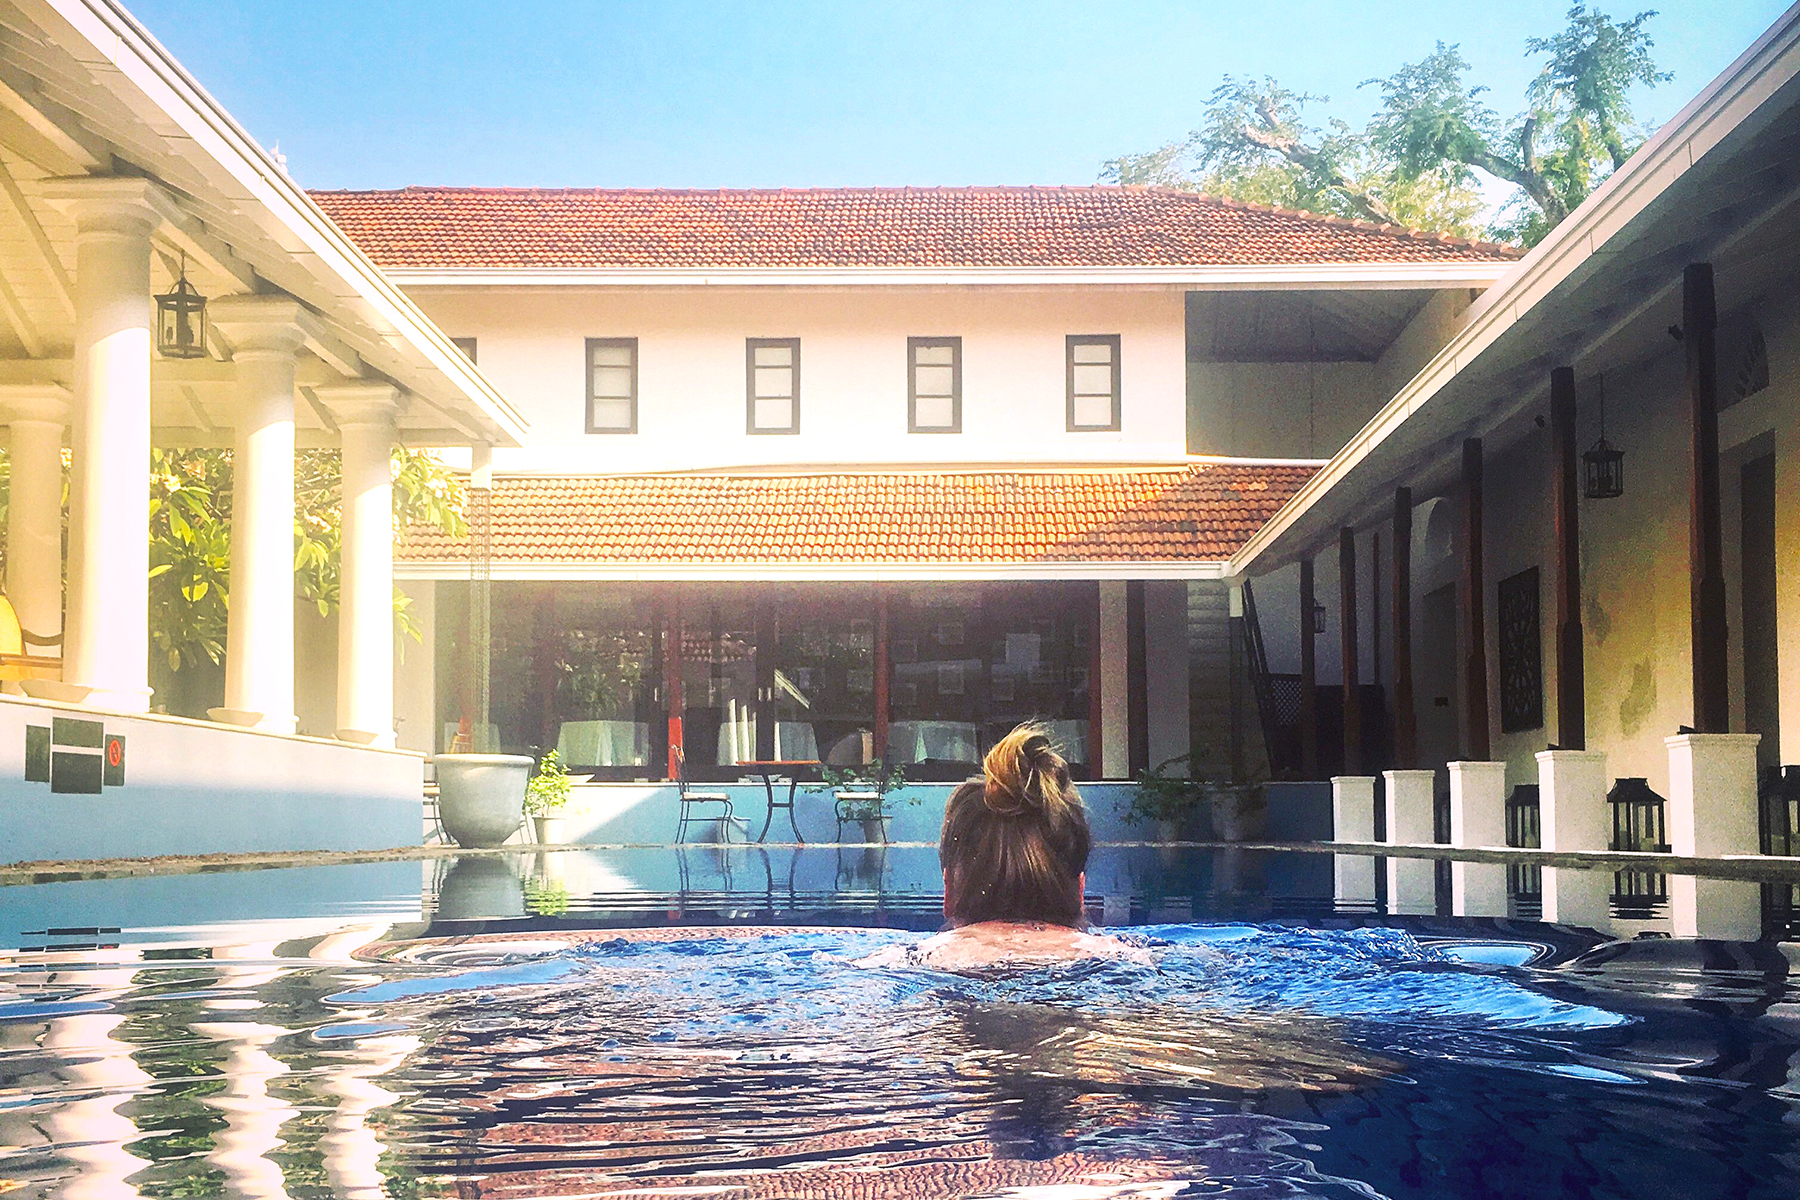 Shopping-Guide Colombo: Der lässige Lifestyle in Sri Lankas Metropole Colombo